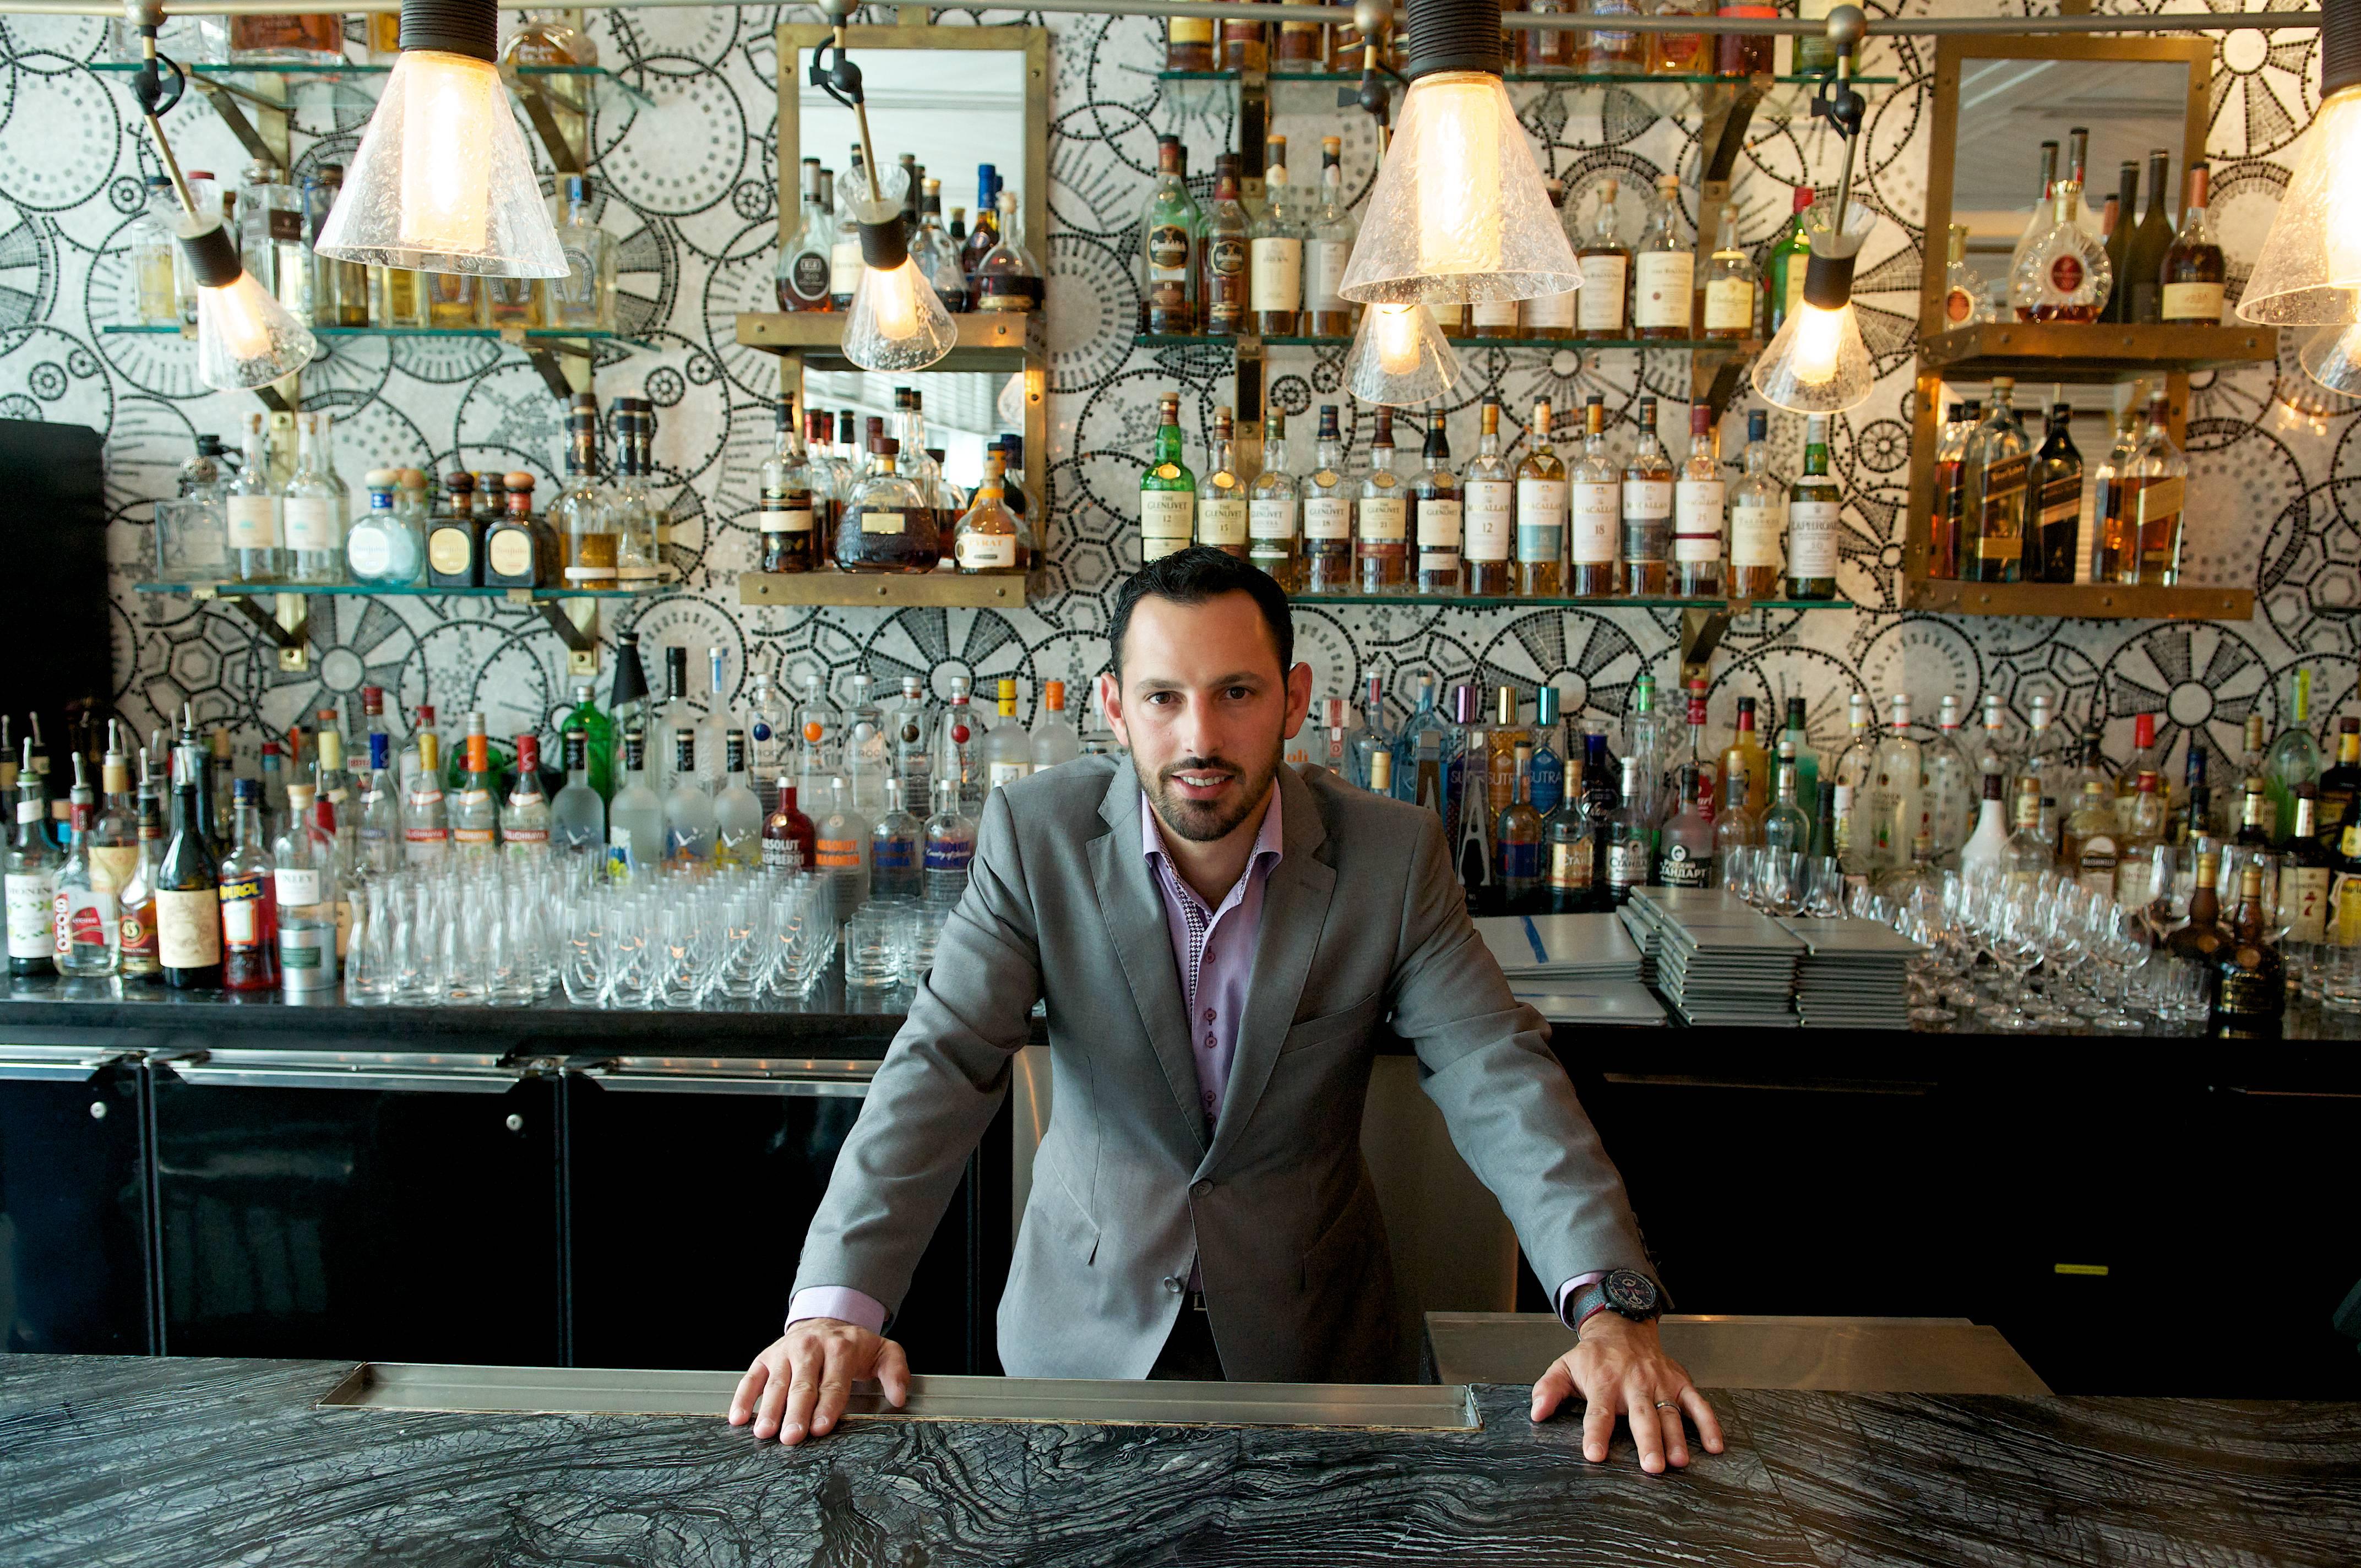 Hector Acevedo – Hotel Mixologist